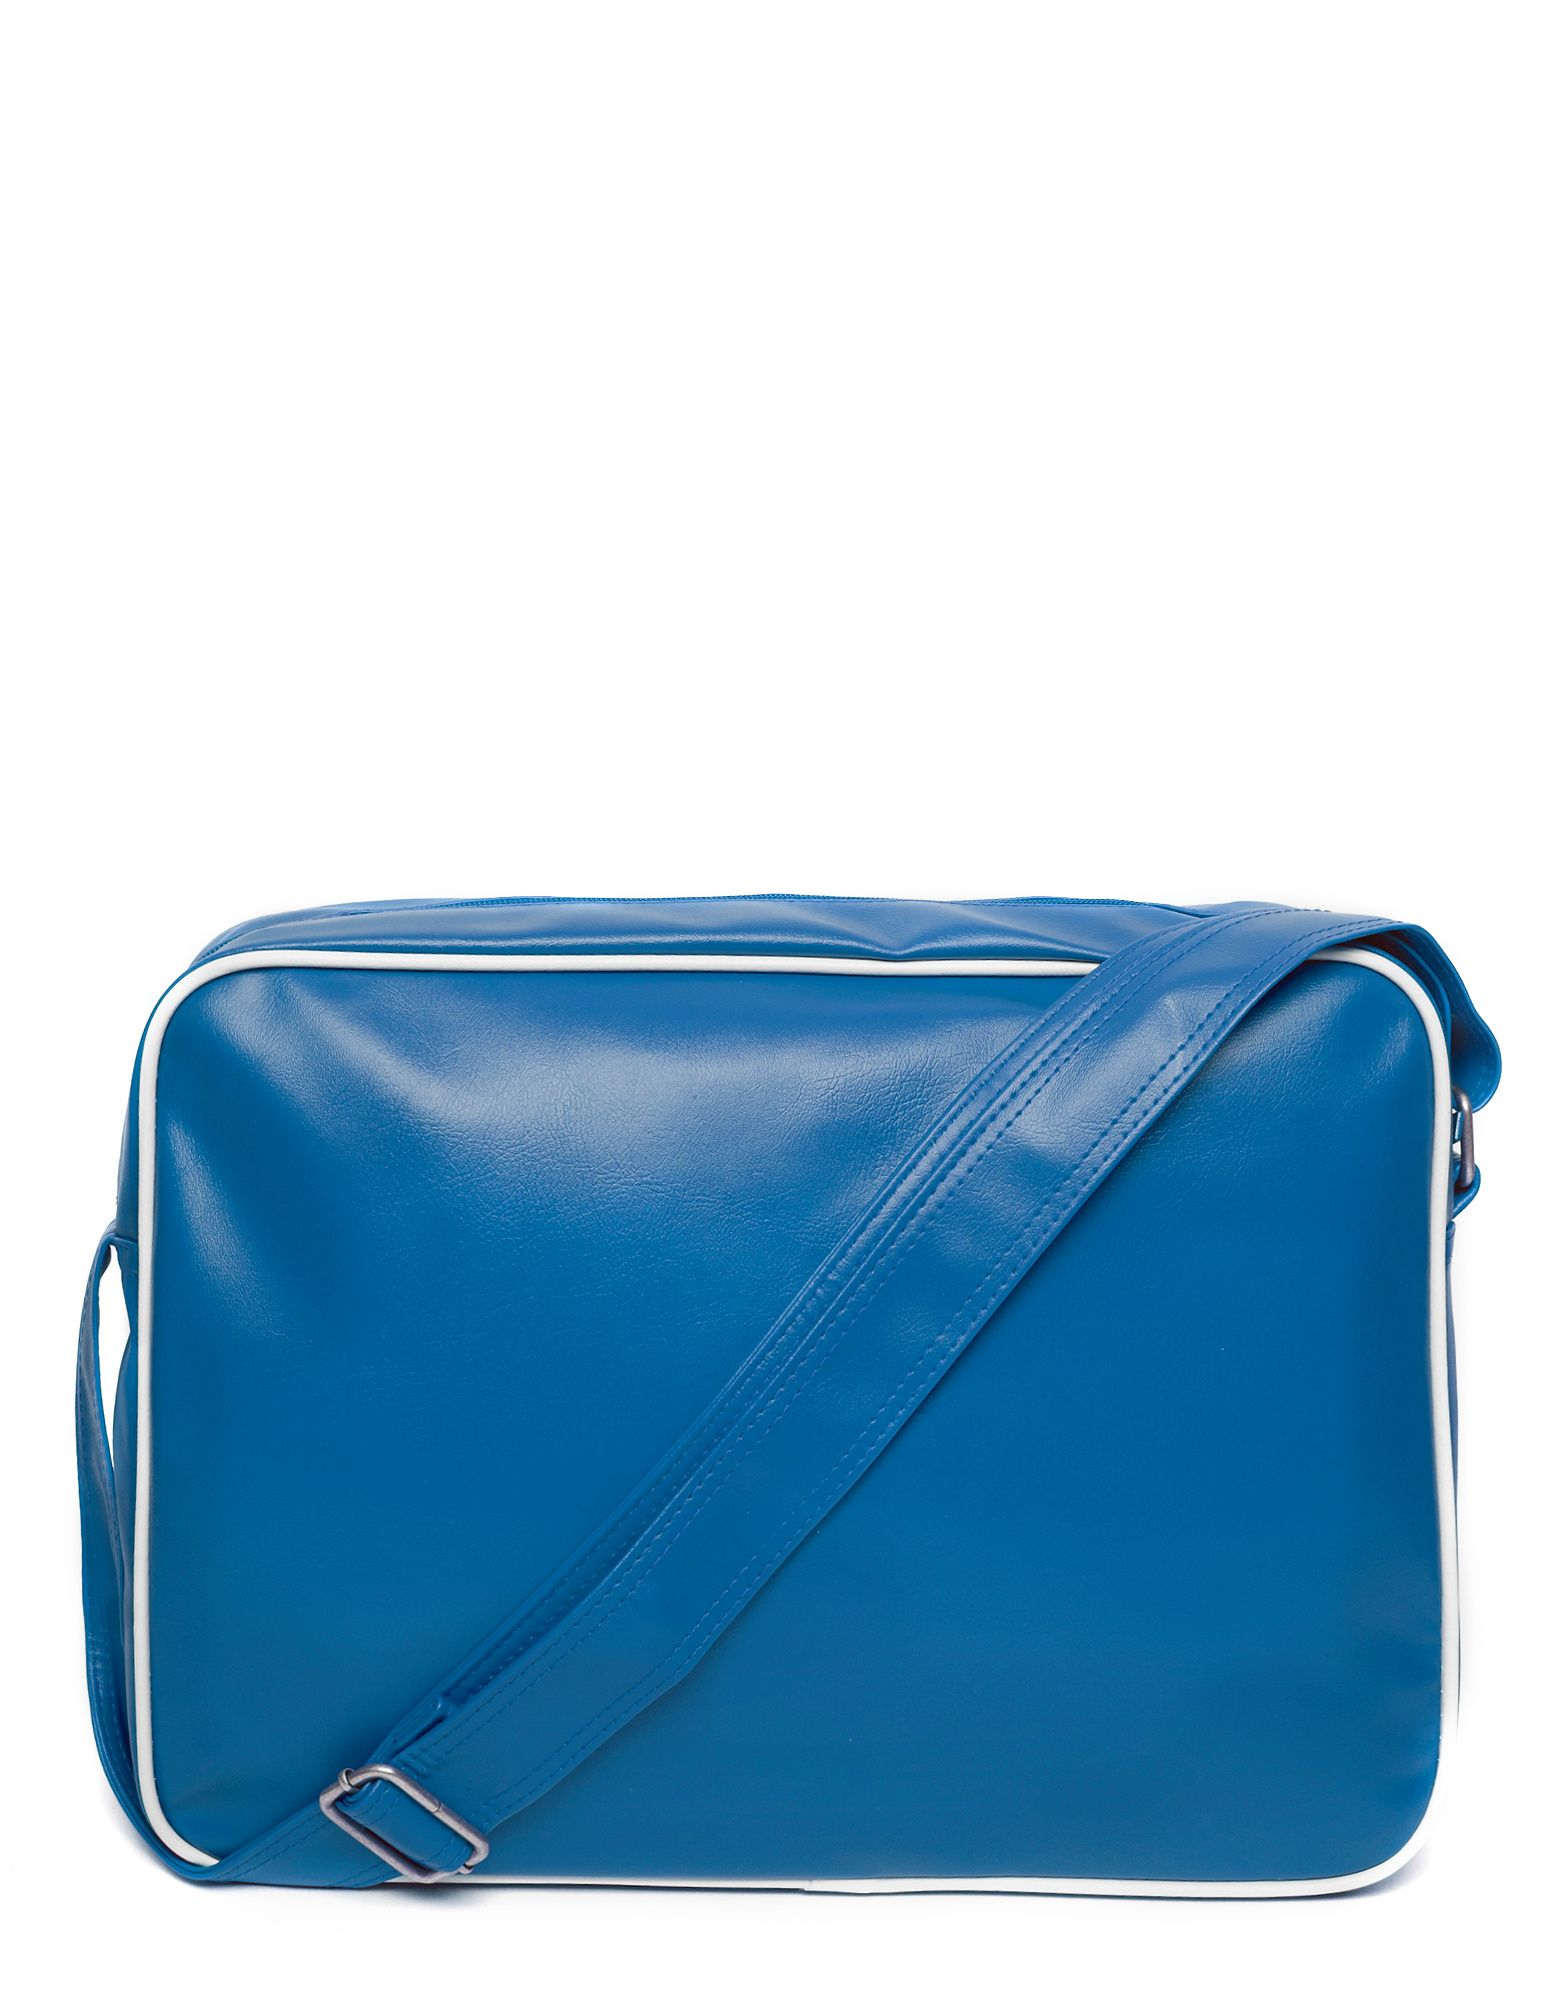 McKenzie Jimmy Messenger Bag